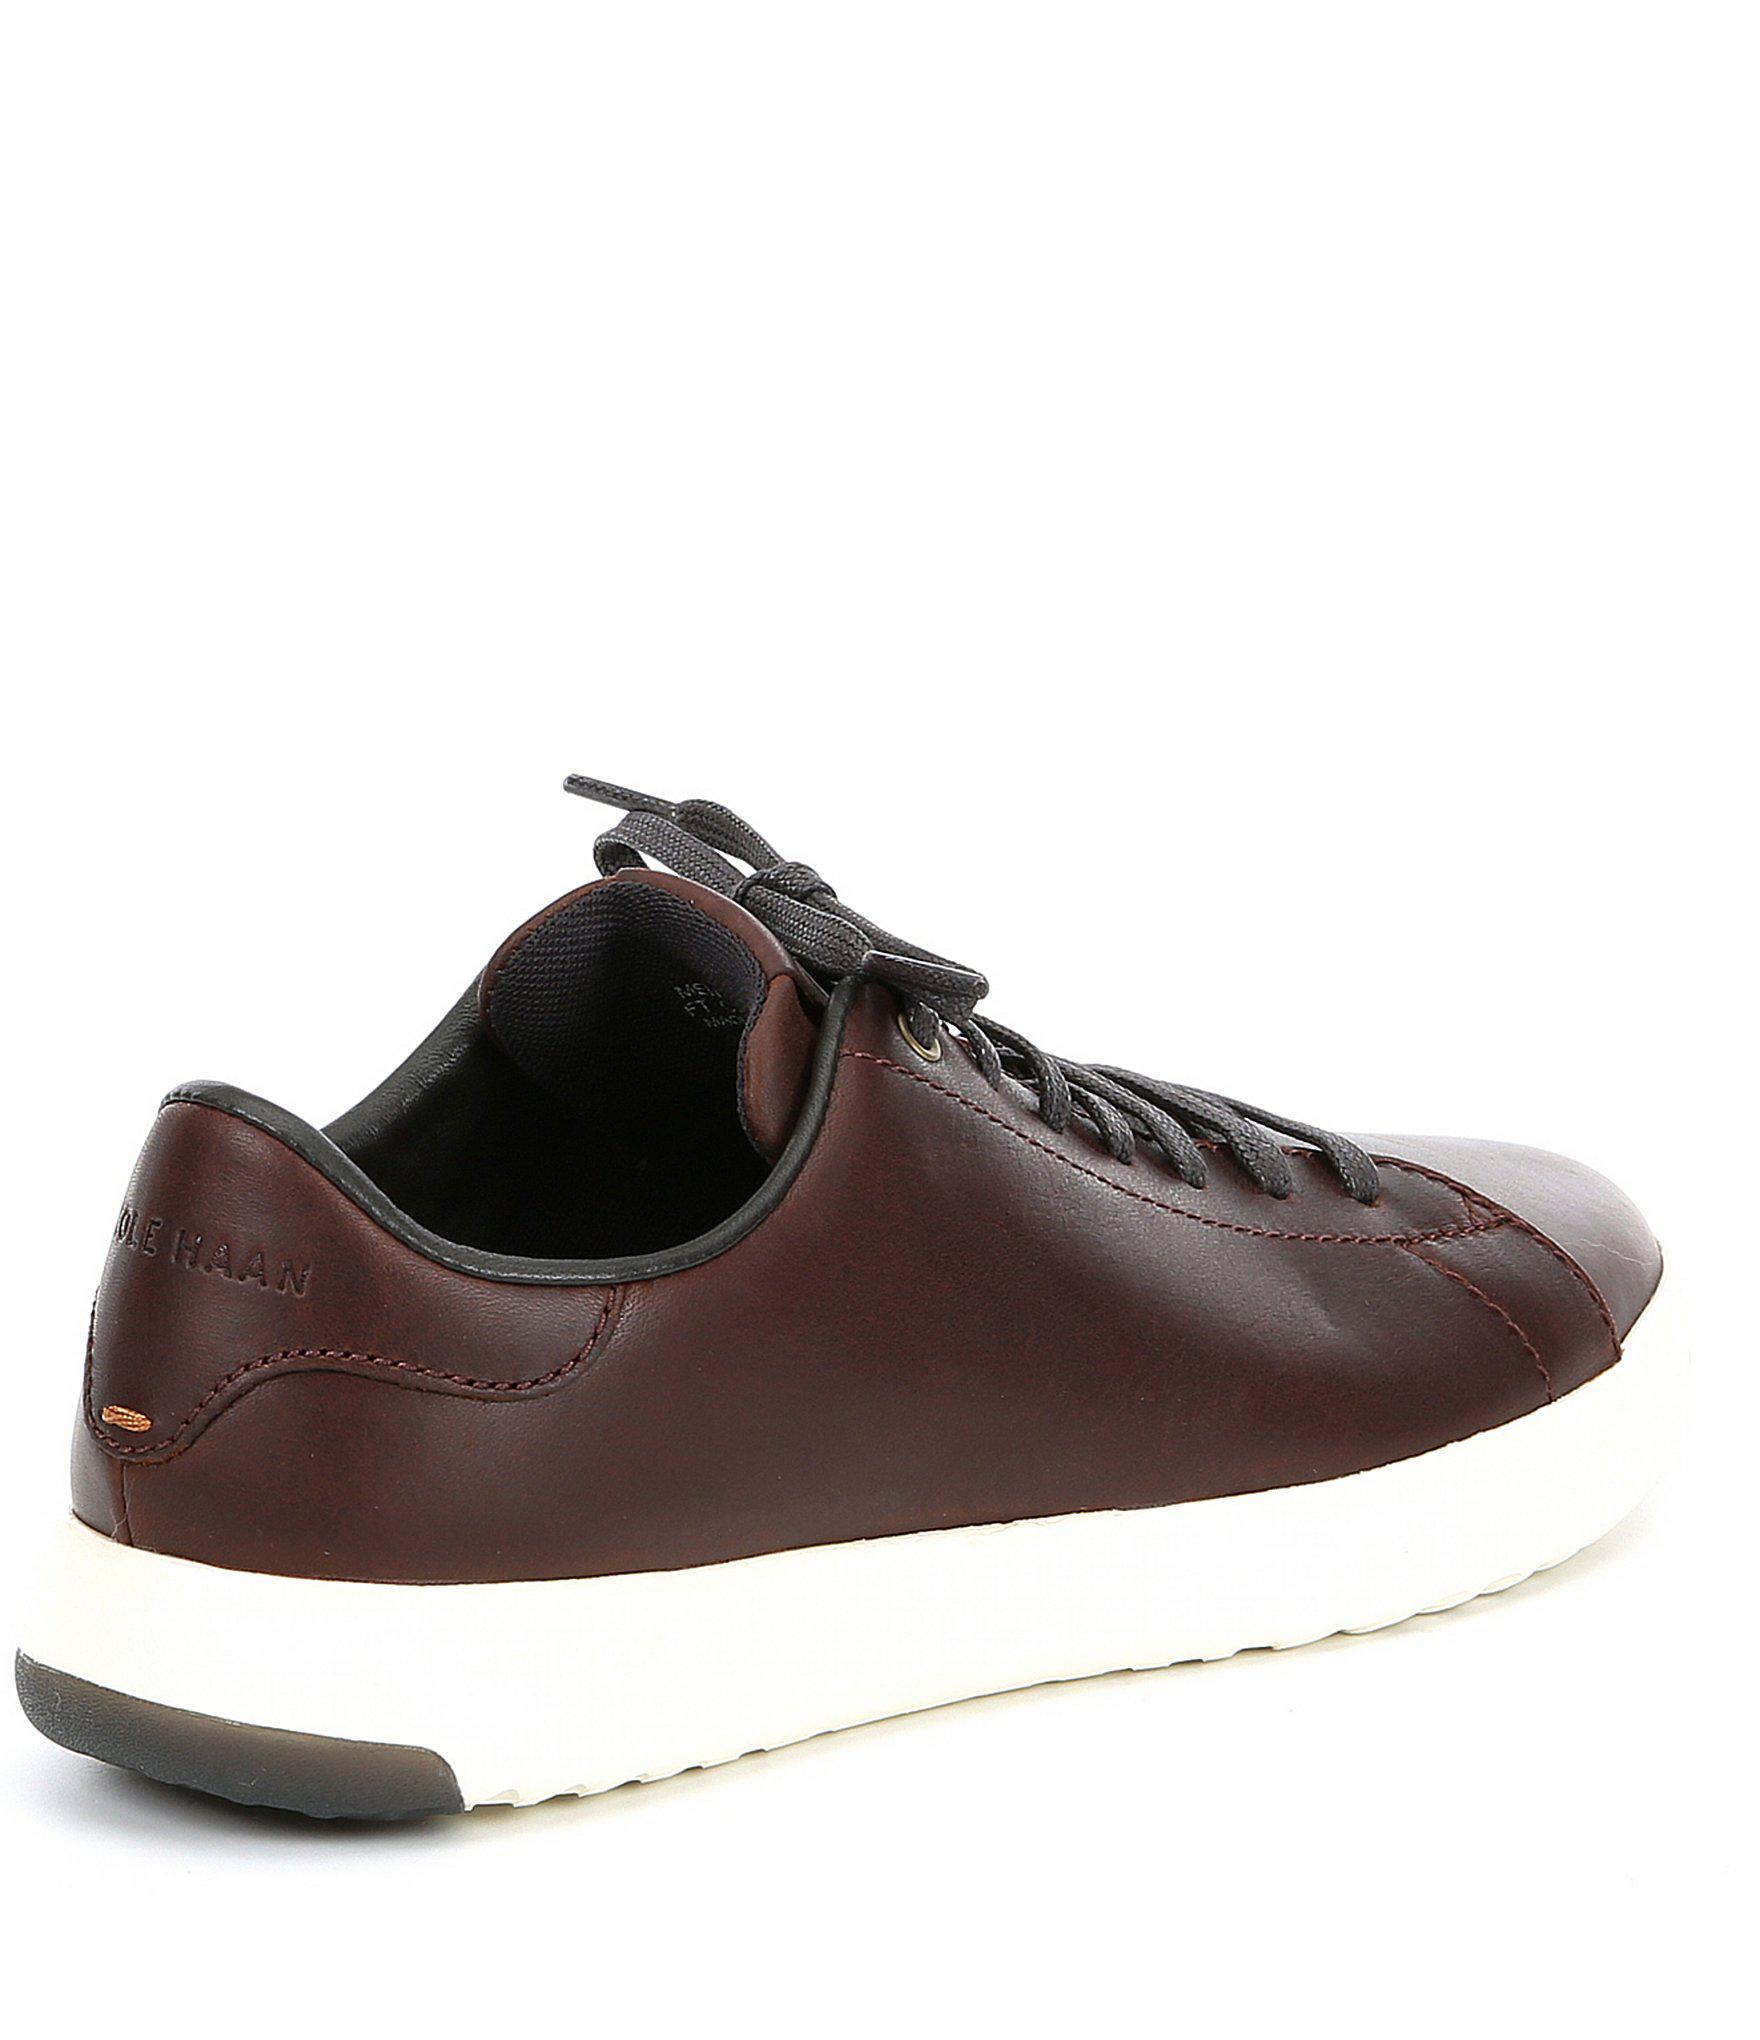 Clearance sale best website special discount of Men's Grandpro Leather Tennis Shoe